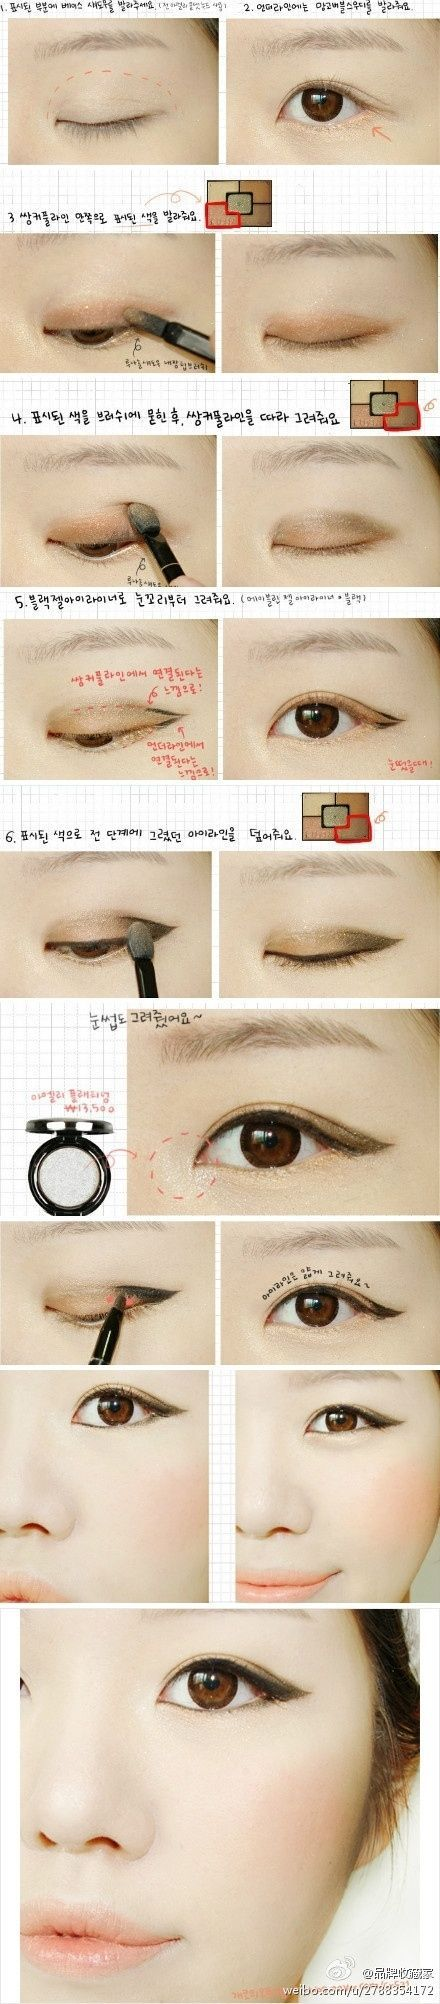 Buy Best Circle Lenses & Big Eye Circle Contact Lenses | EyeCandy's #coloredeyecontacts